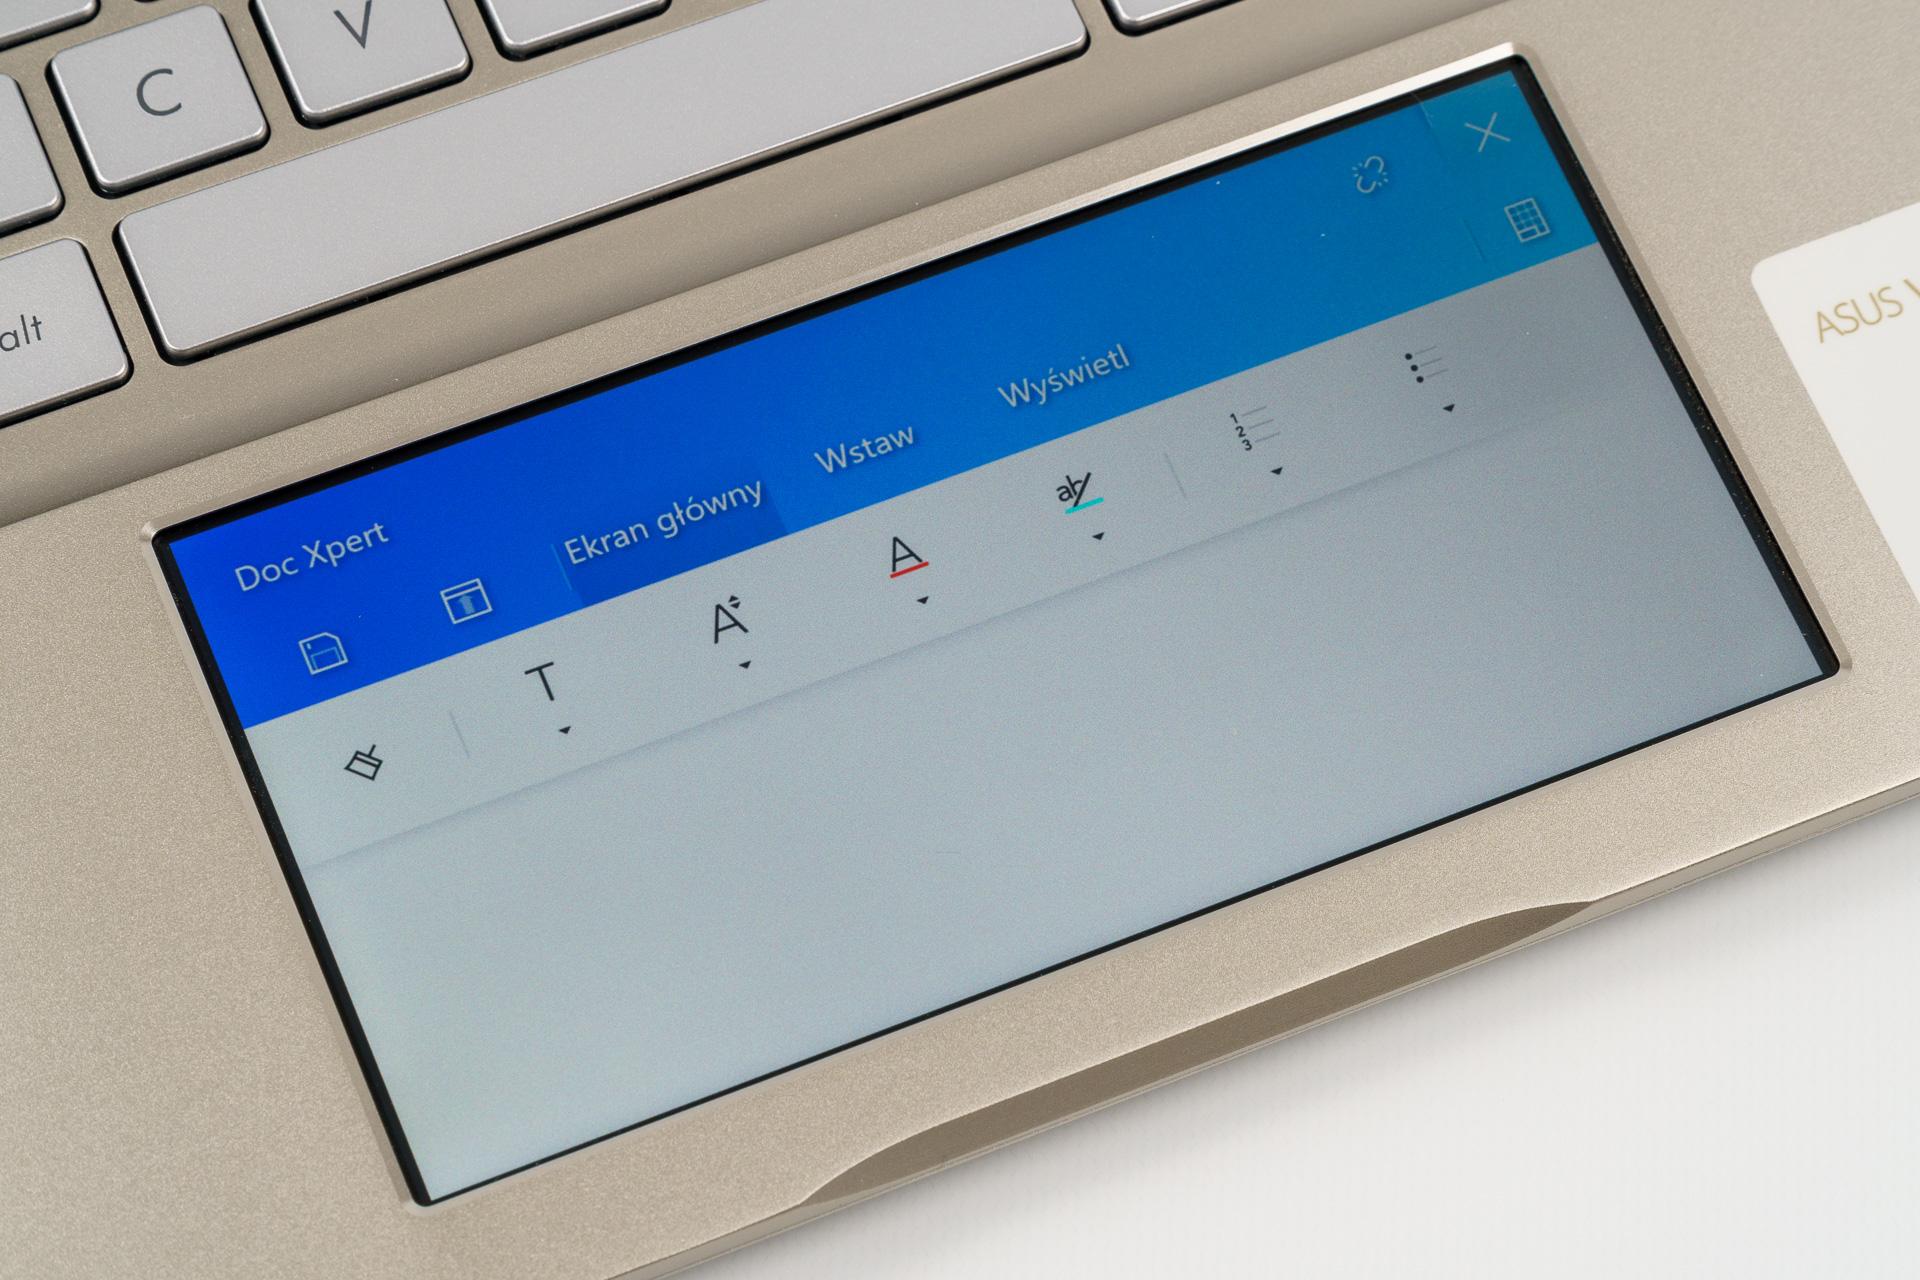 Asus VivoBook ze ScreenPadem, czyli po co w notebooku drugi ekran? 19